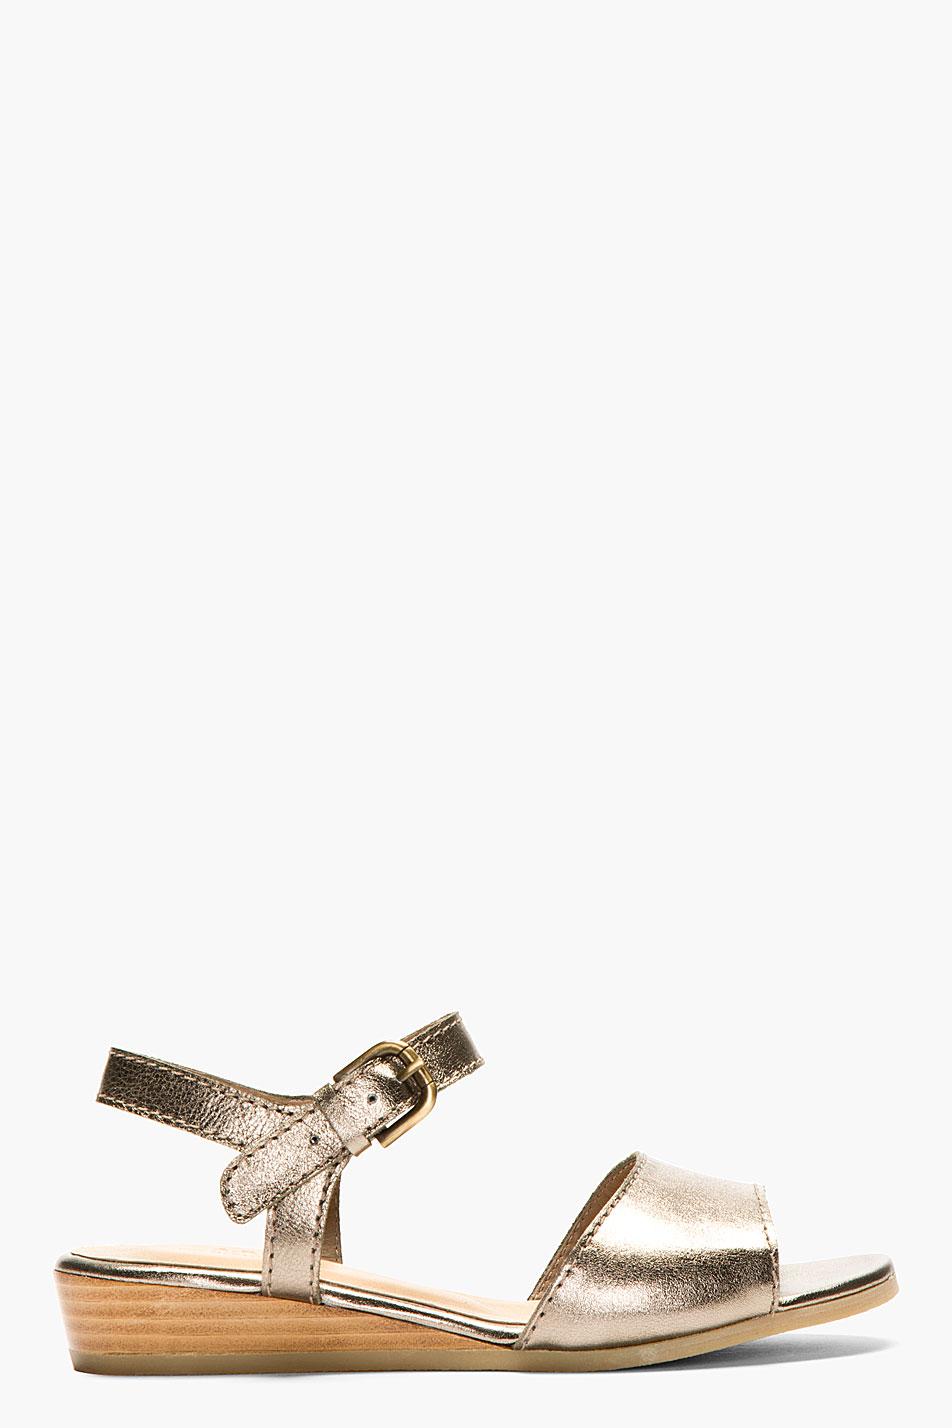 A.p.c. bronze leather roma flat sandals